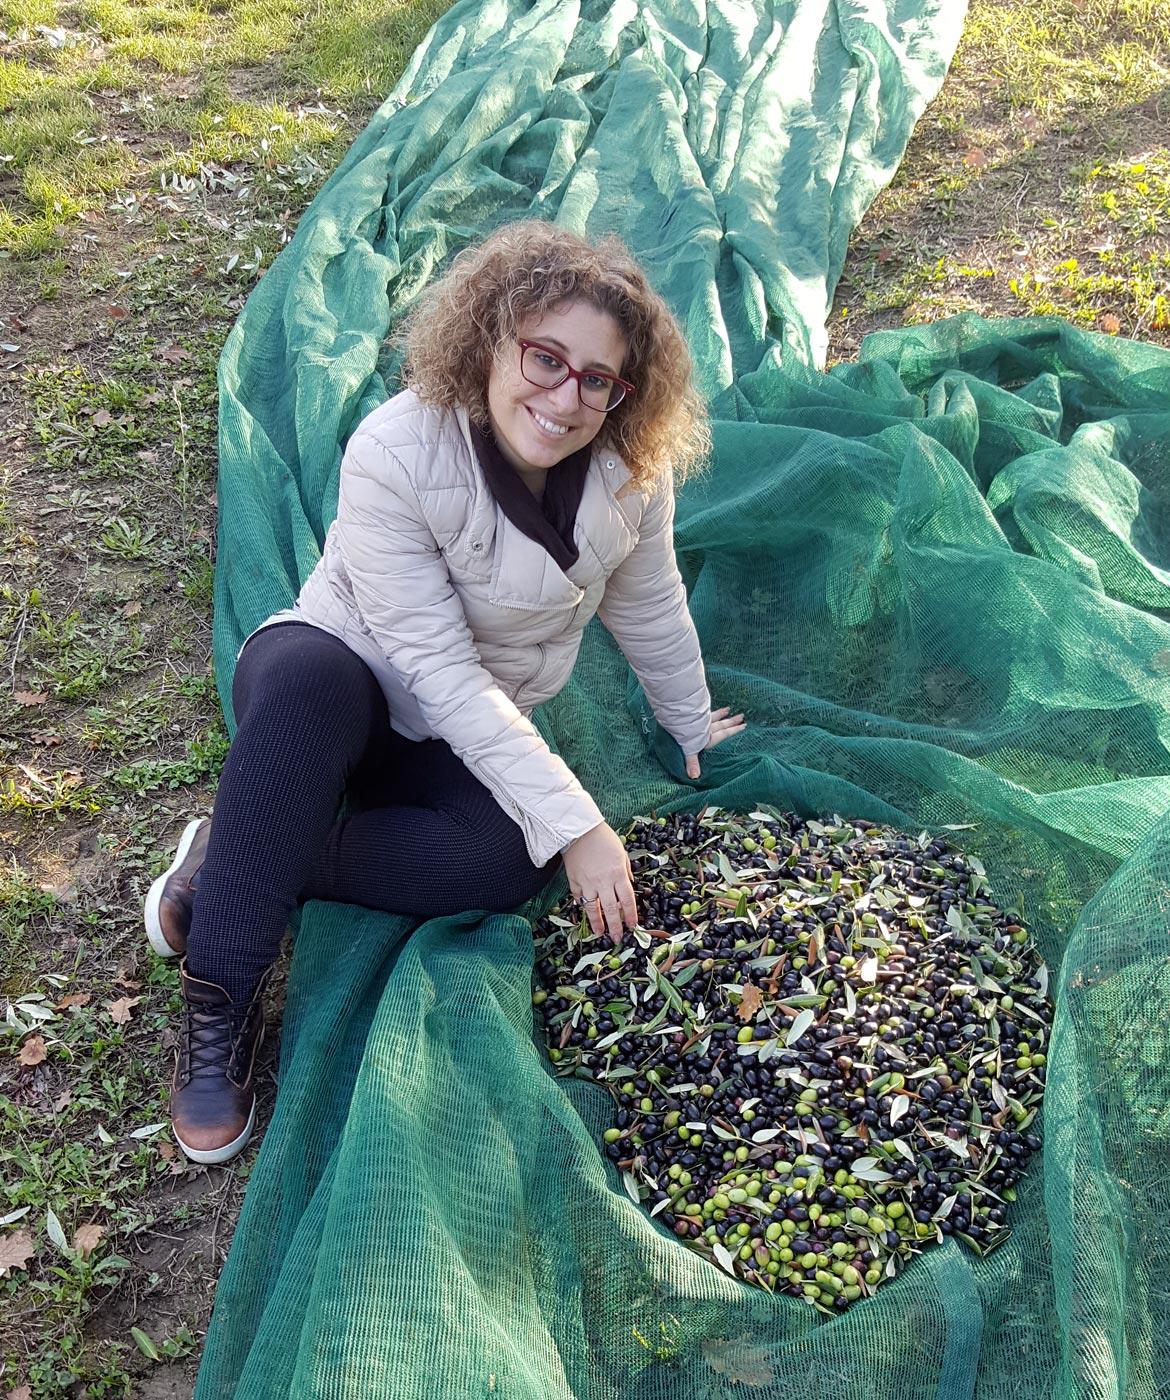 raccolta olive, rete olive